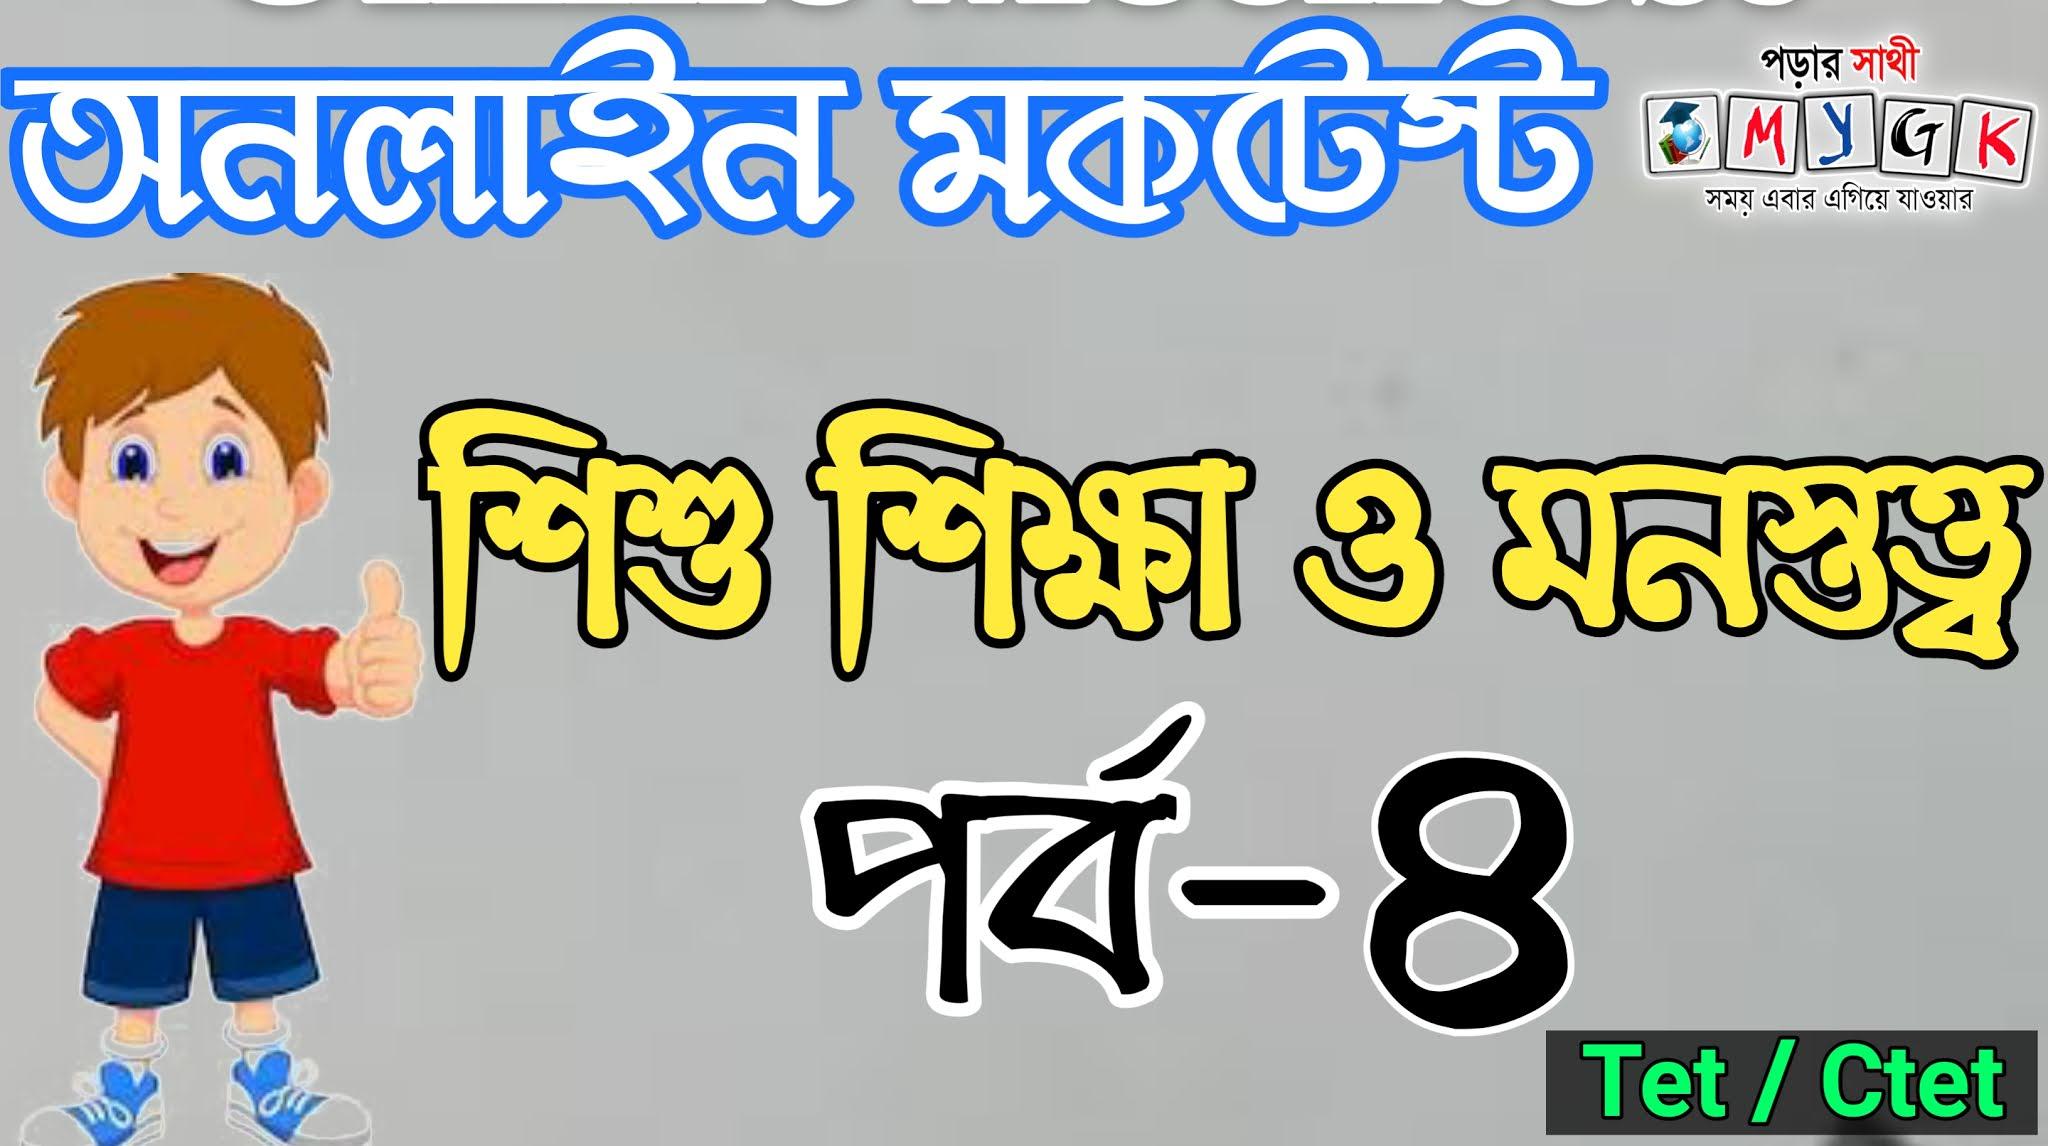 Online Mocktest On Child Study And Pedagogy In Bengali For Primary Tet/Ctet Exam -(Part-4) || শিশুশিক্ষা ও শিশুমনস্তত্ত্ব অনলাইন মকটেস্ট - প্রাথমিক টেট